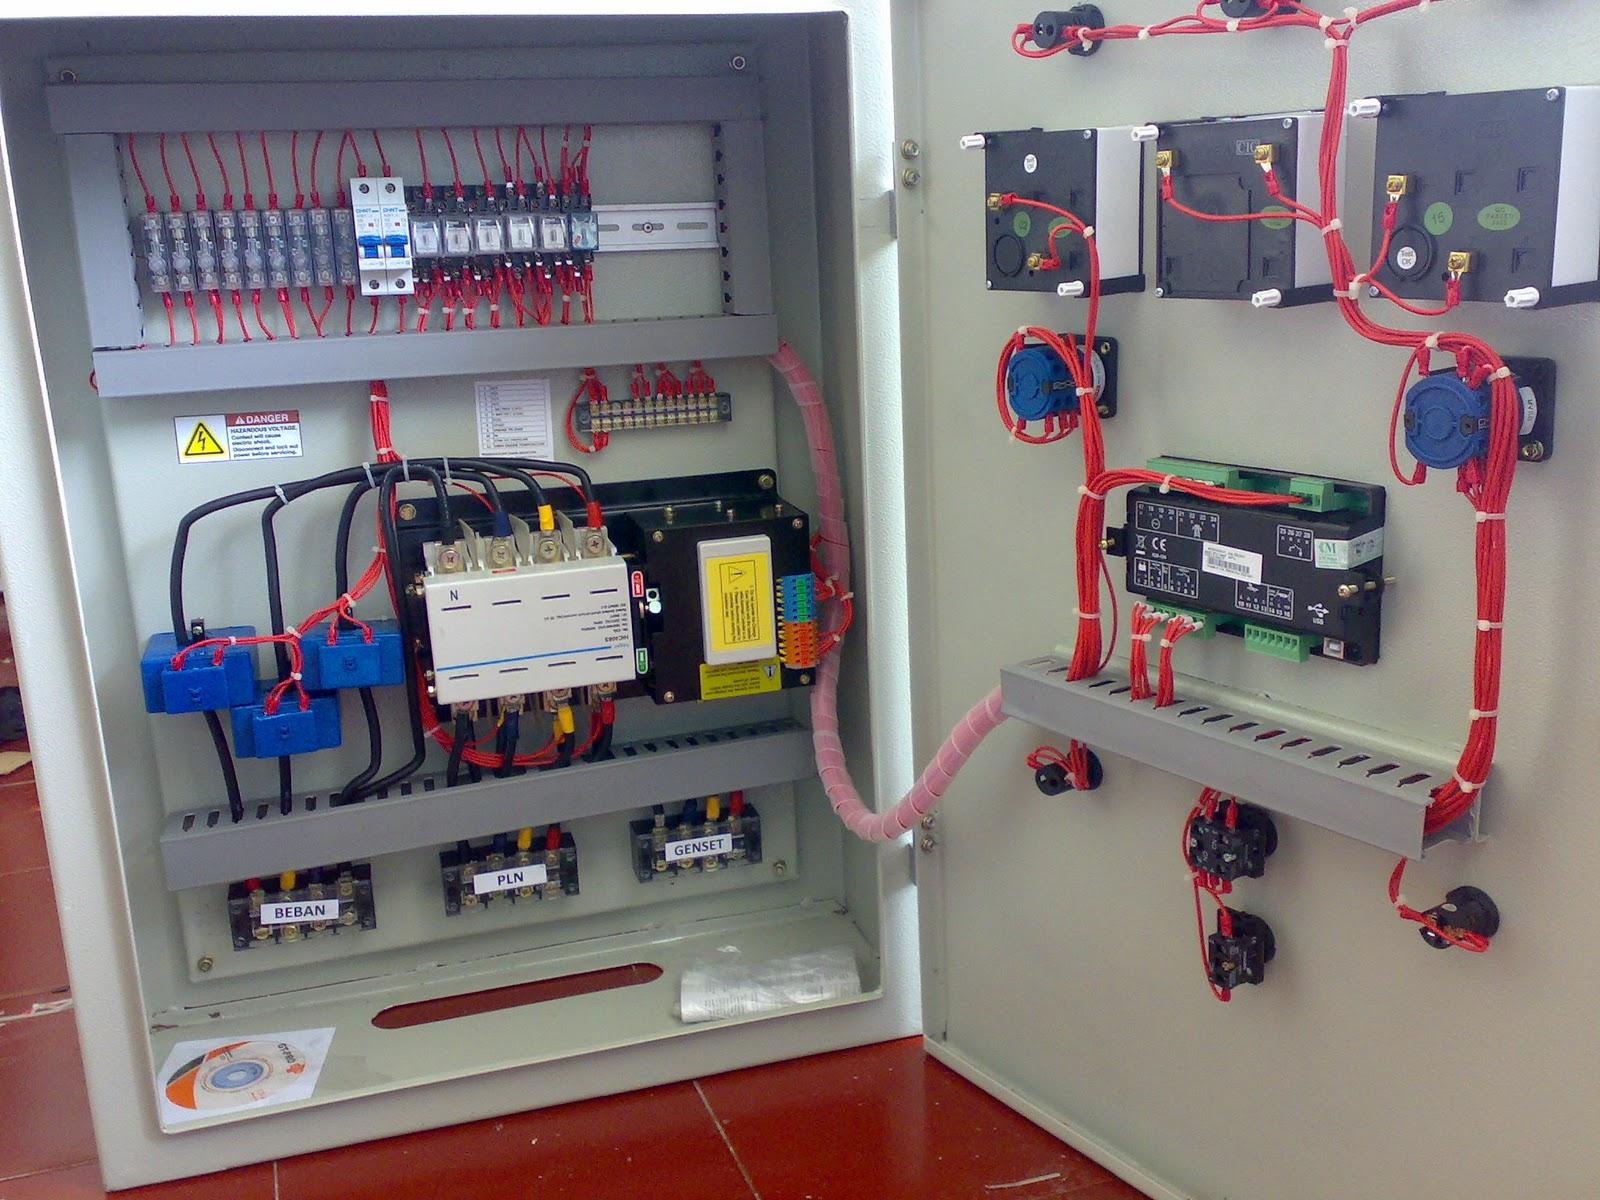 caturindo prima engineering jual panel ats amf rh caturindo pe blogspot com control panel wiring [ 1600 x 1200 Pixel ]